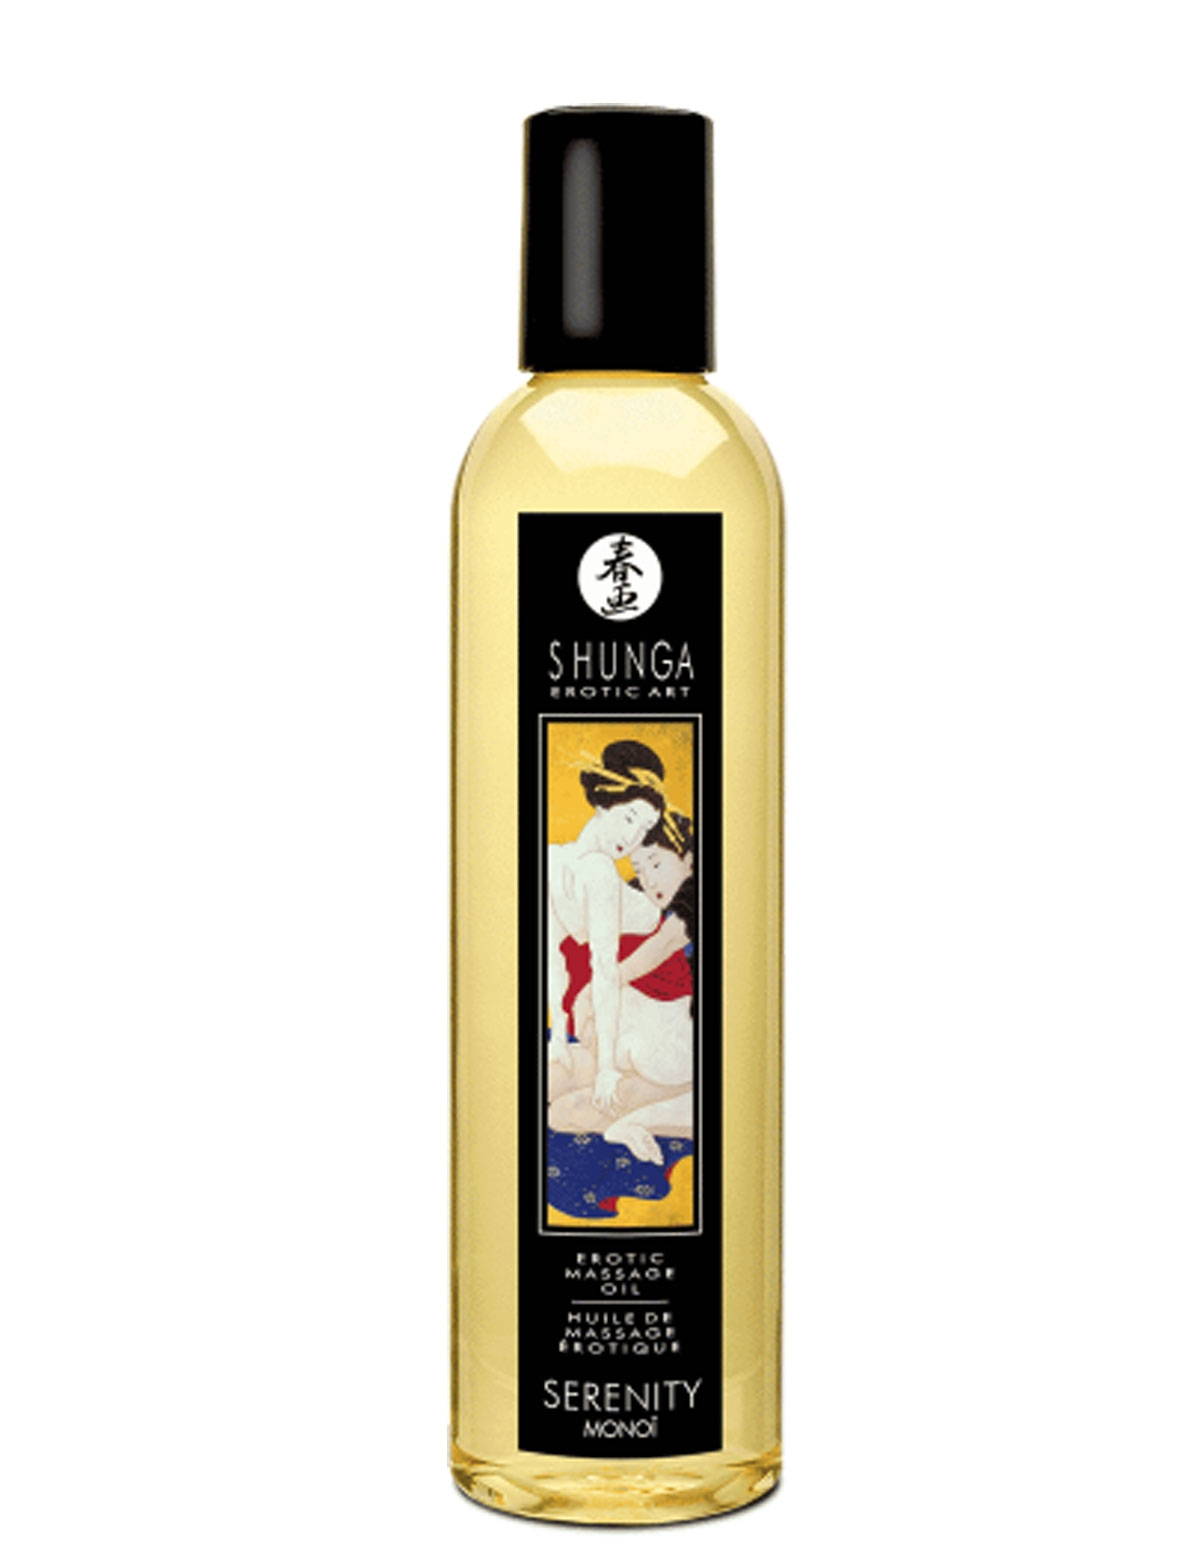 Erotic Massage Oil Serenity Monoi